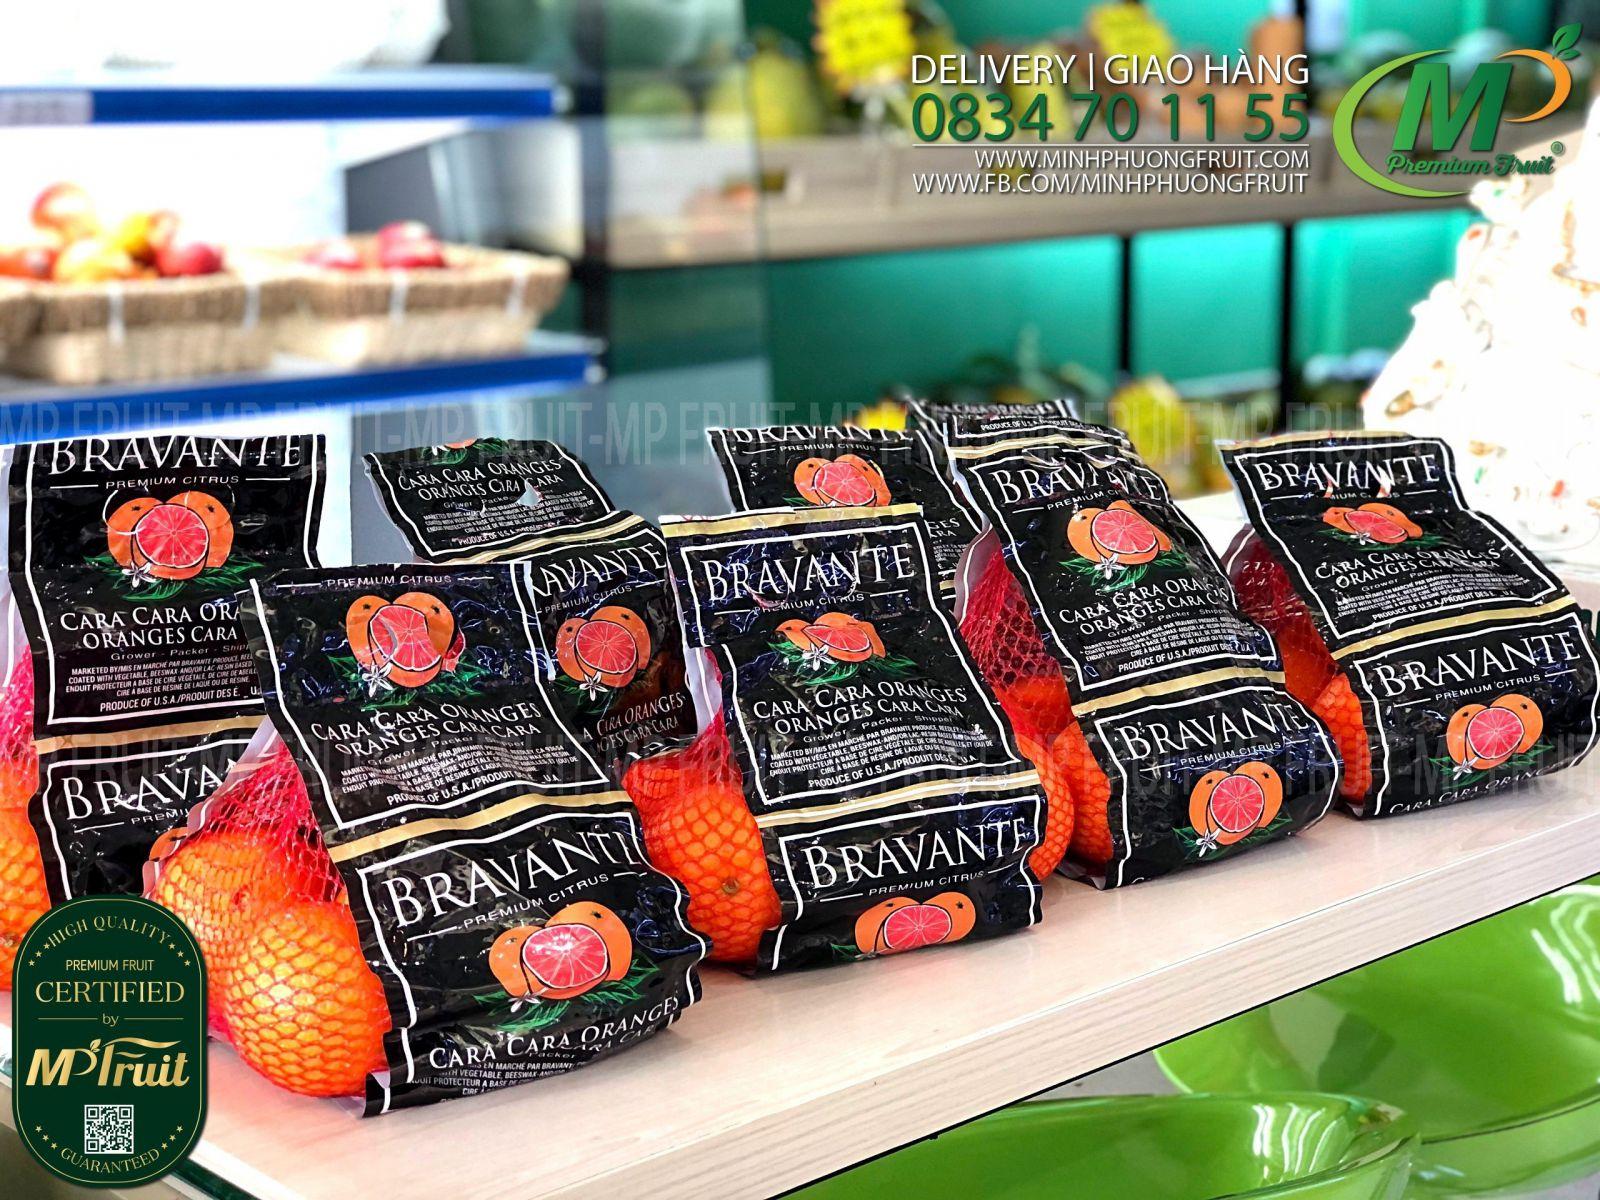 Cam Đỏ Cara Bravante Mỹ tại MP Fruit